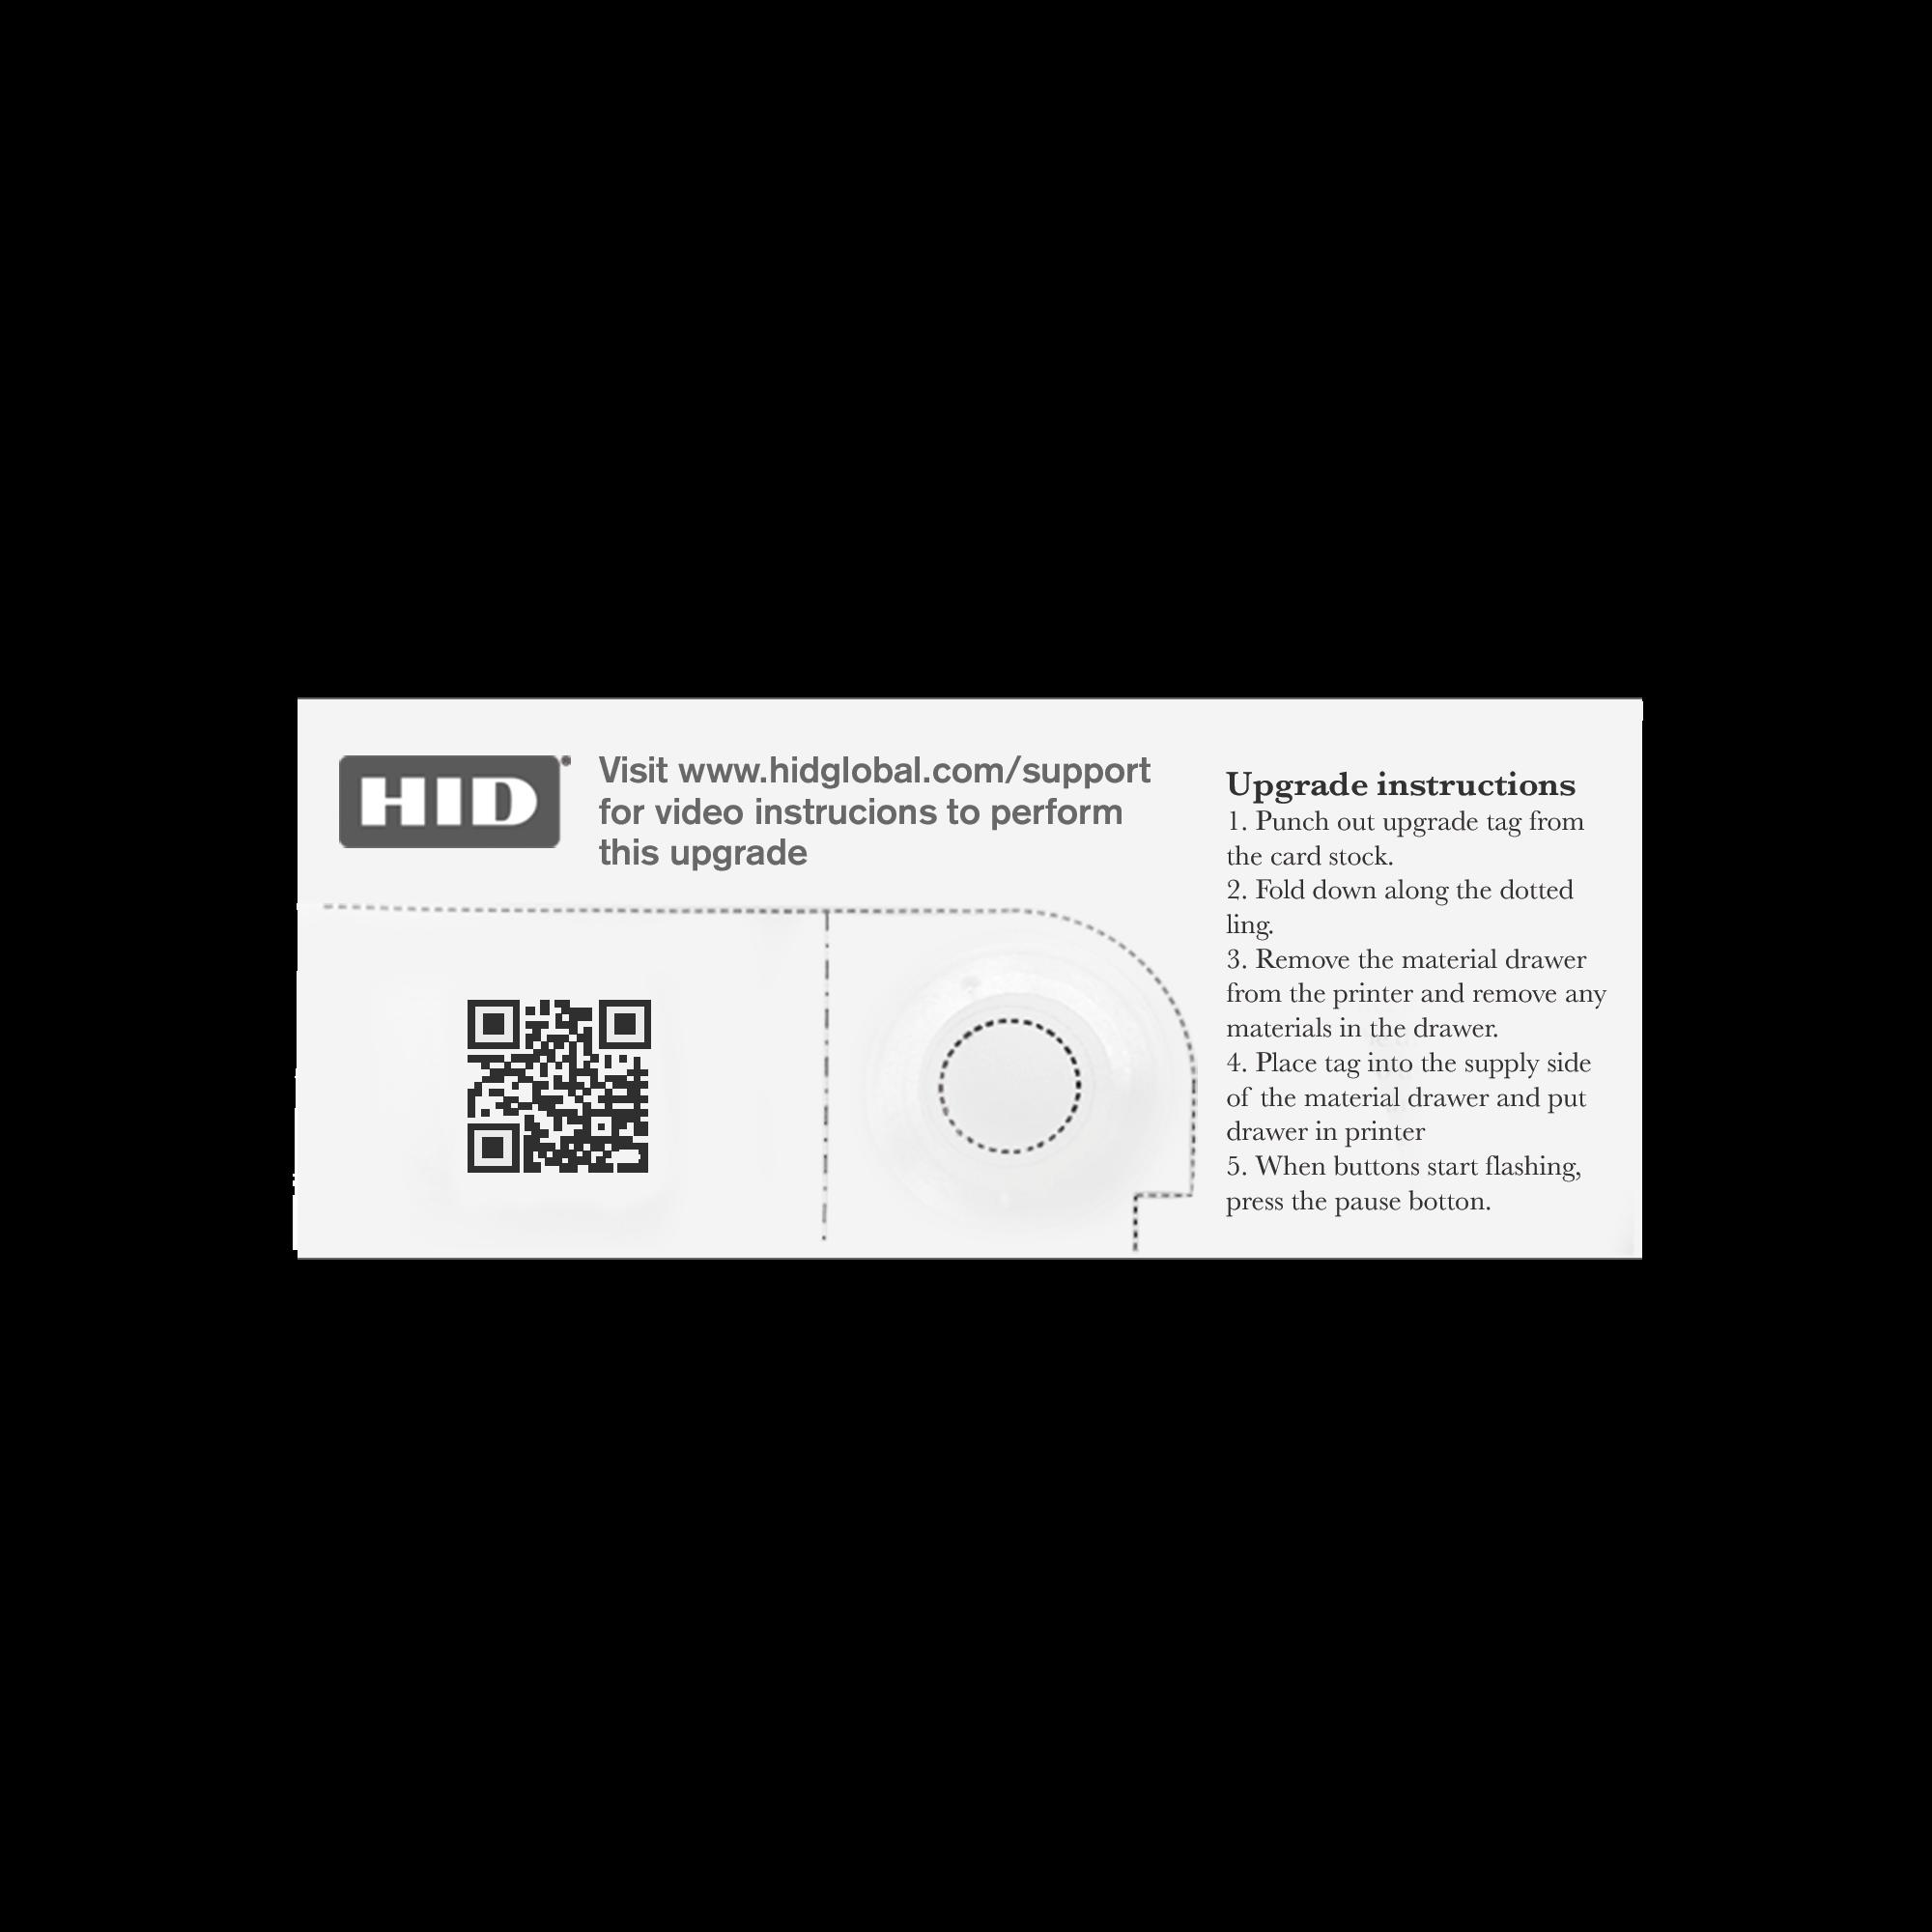 Módulo de Volteo para DTC1500 (Tag para actualización en Campo)